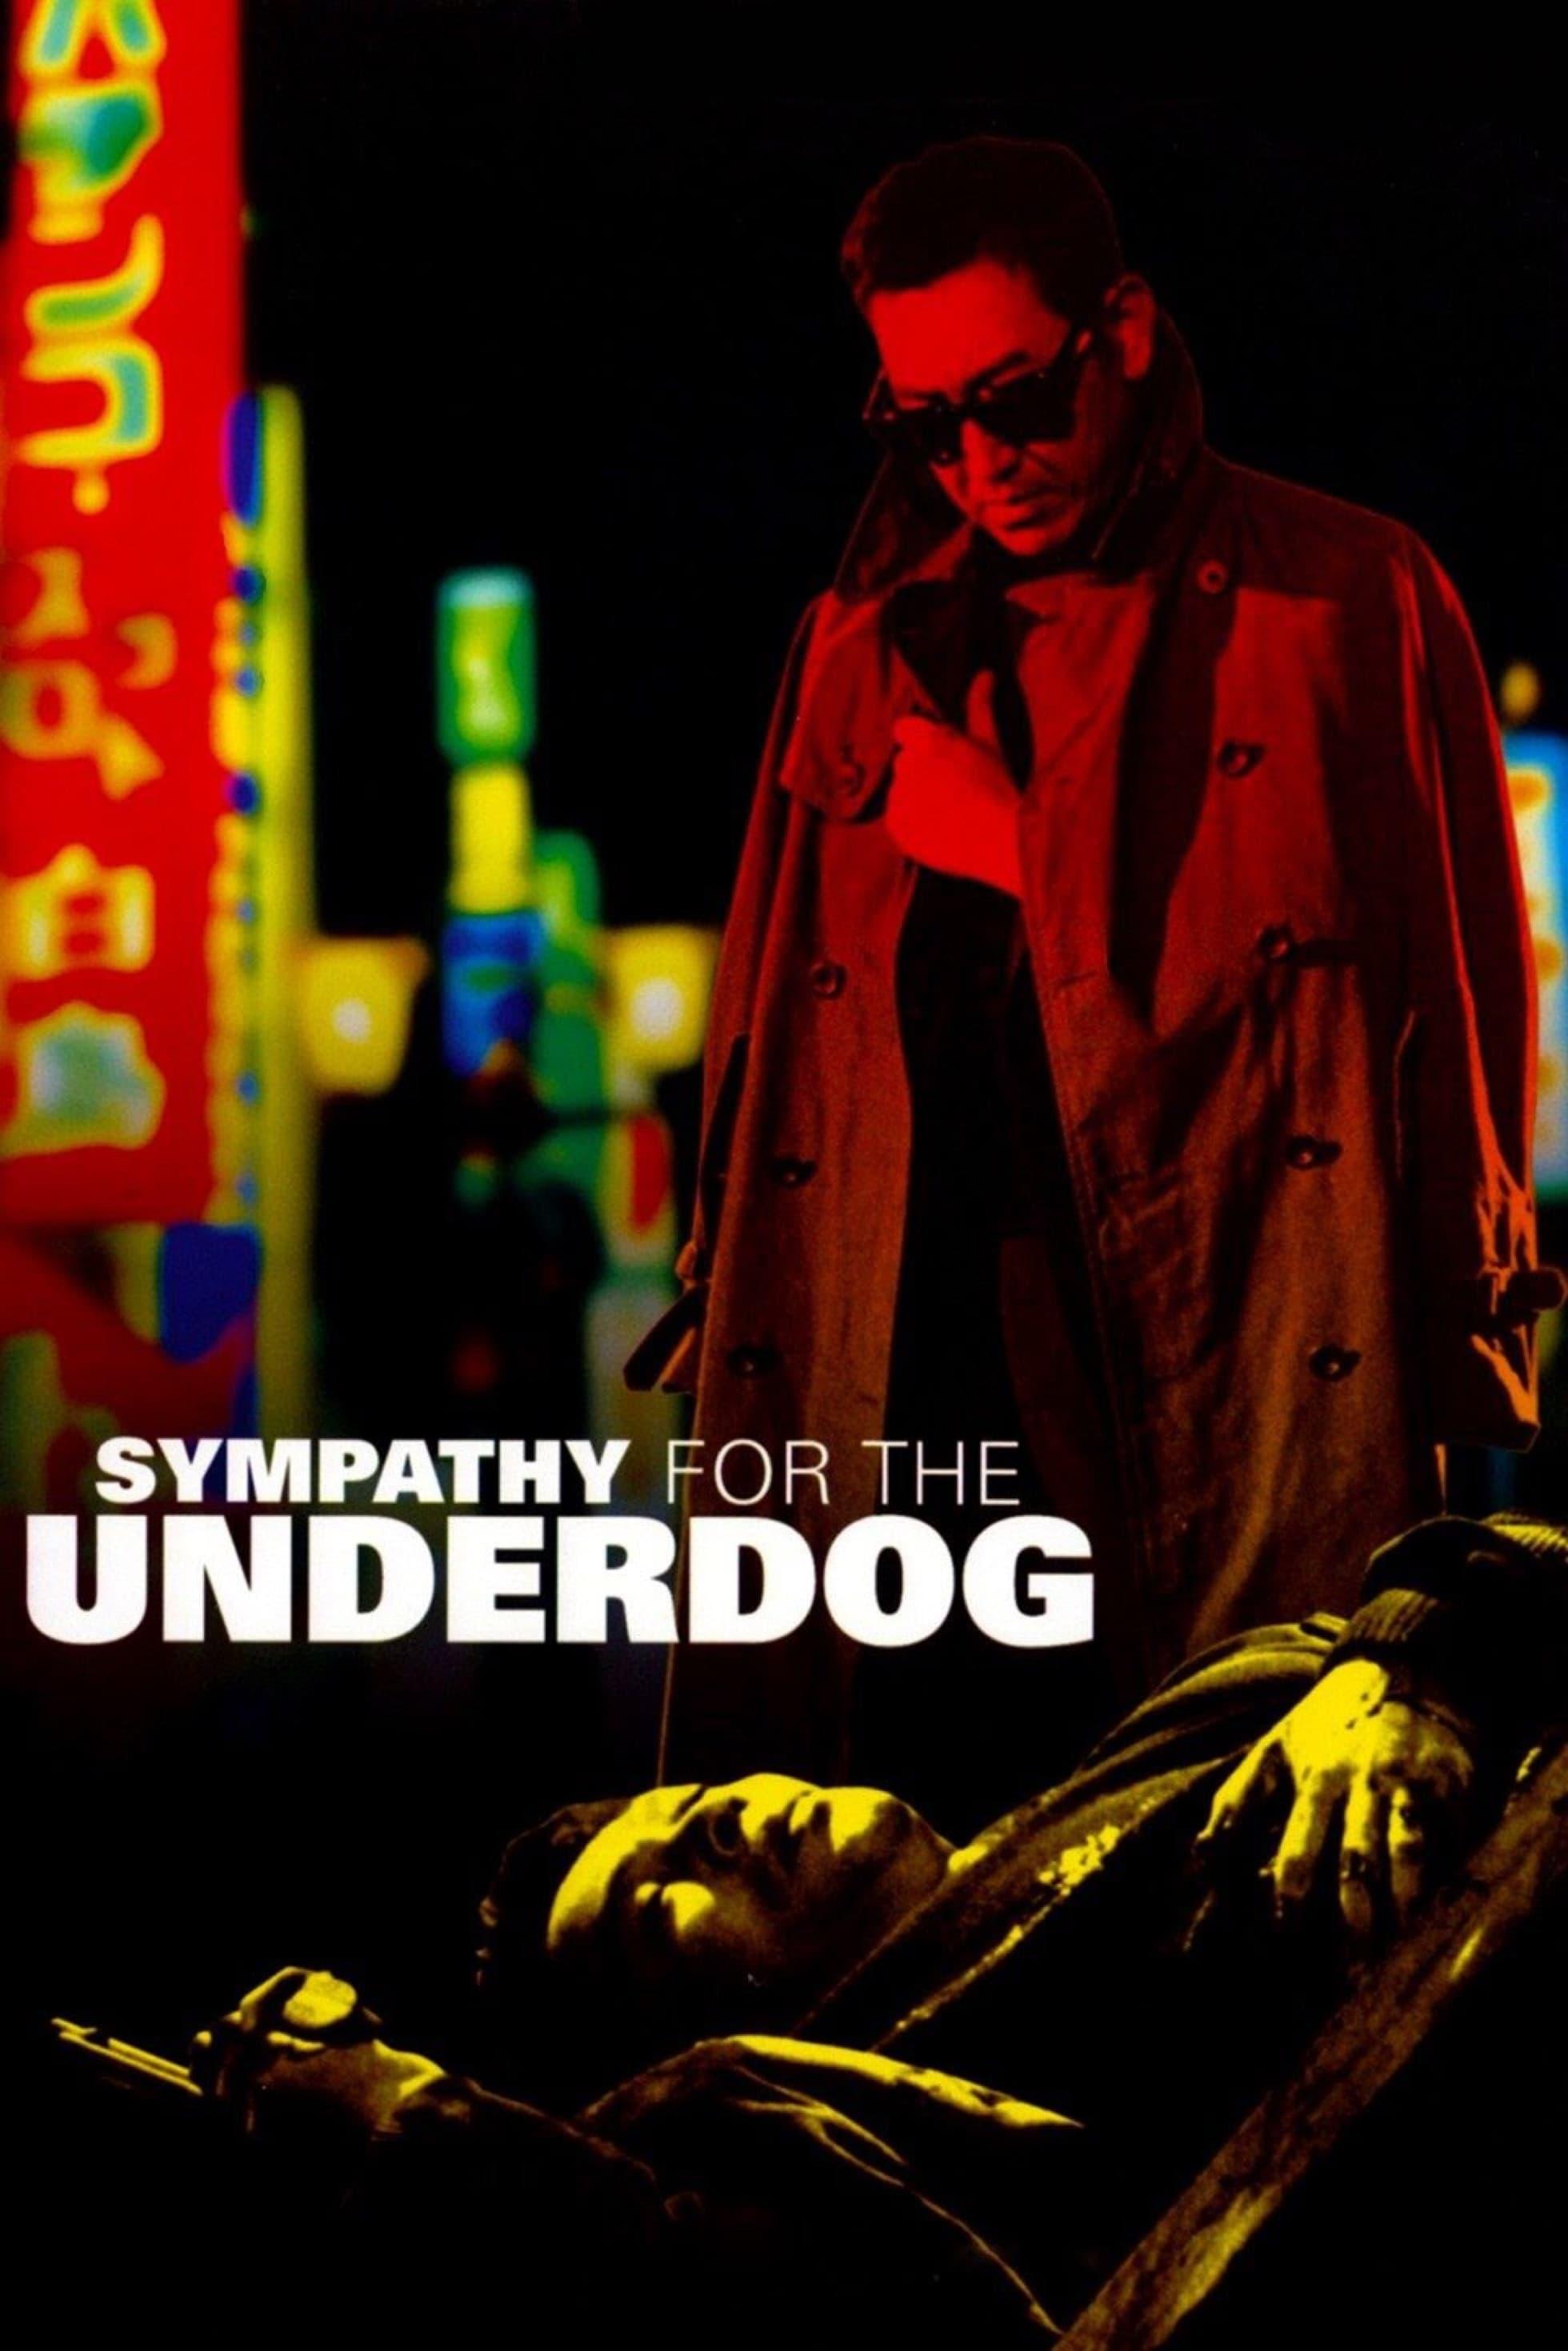 Sympathy for the Underdog